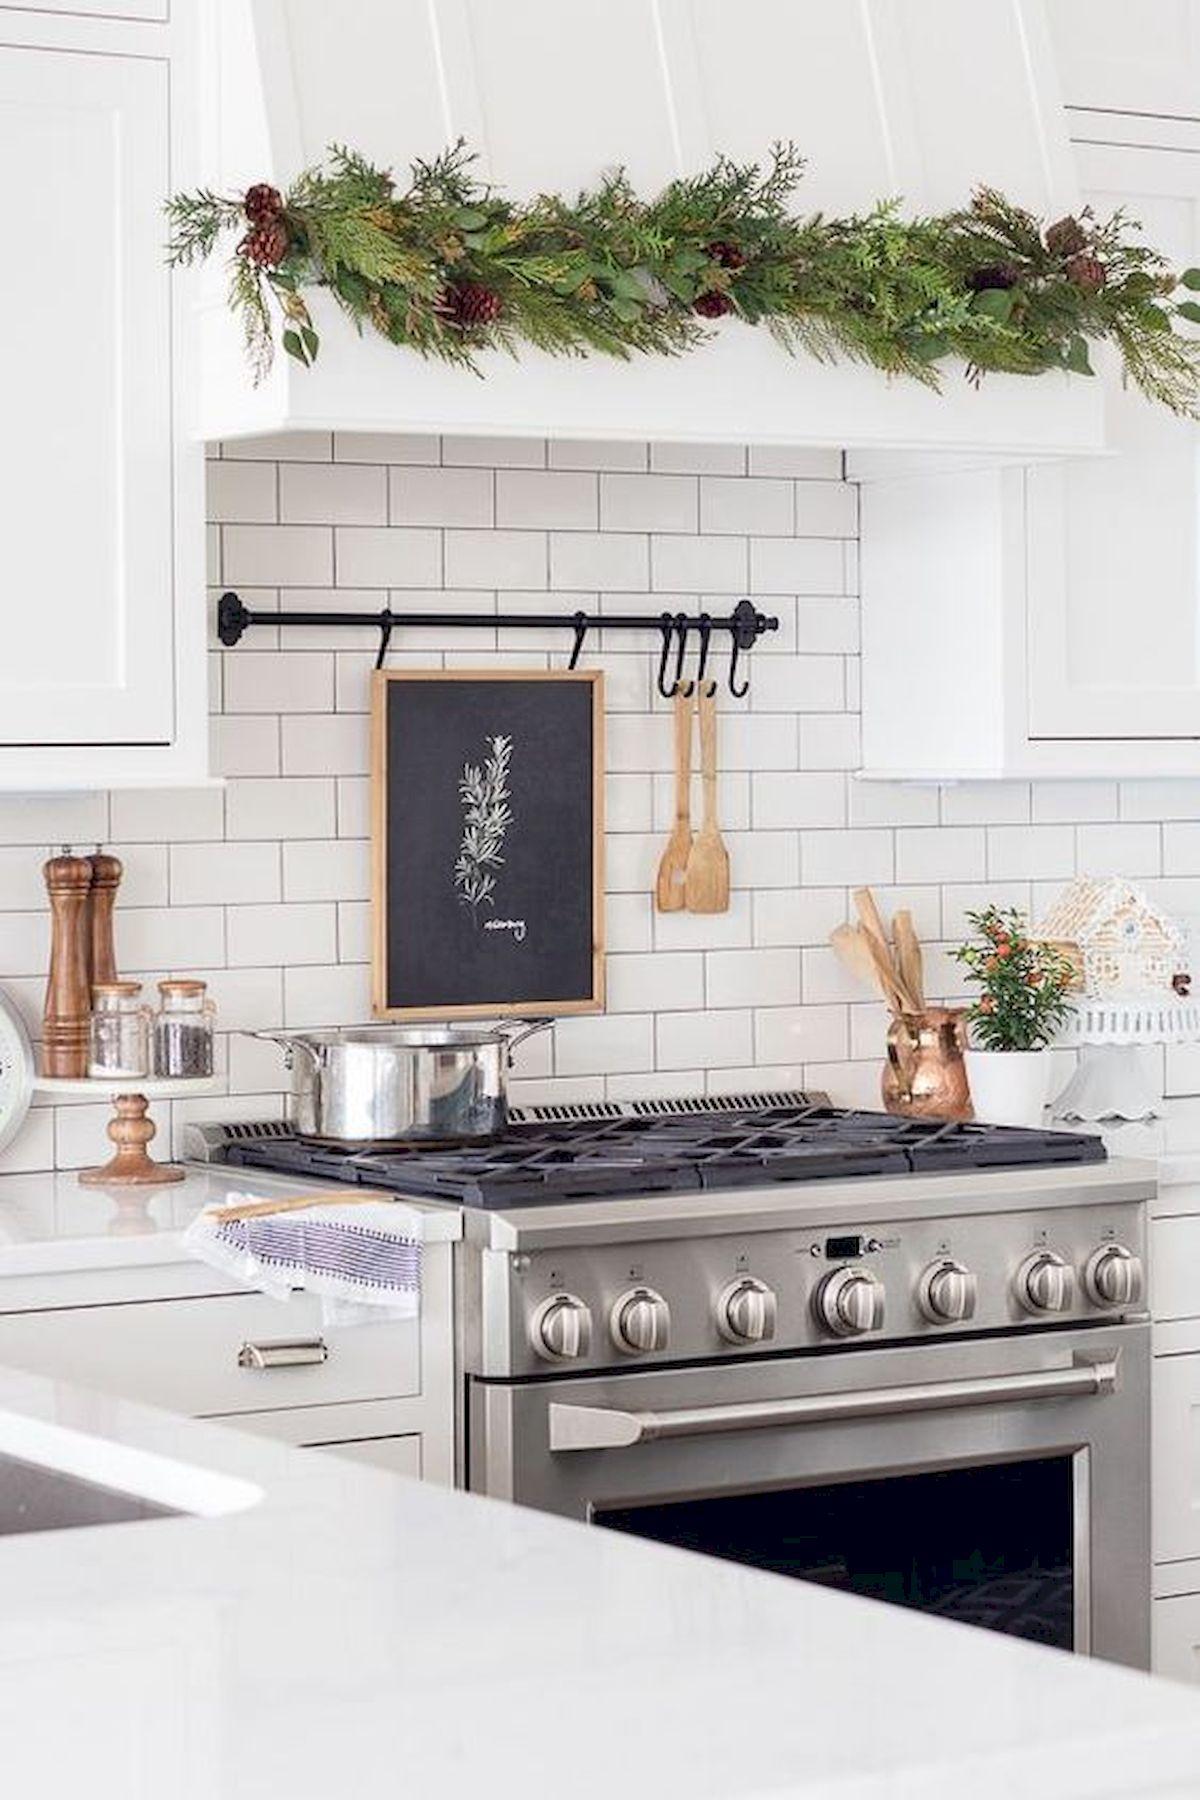 45 Easy Kitchen Decor and Design Ideas (31)